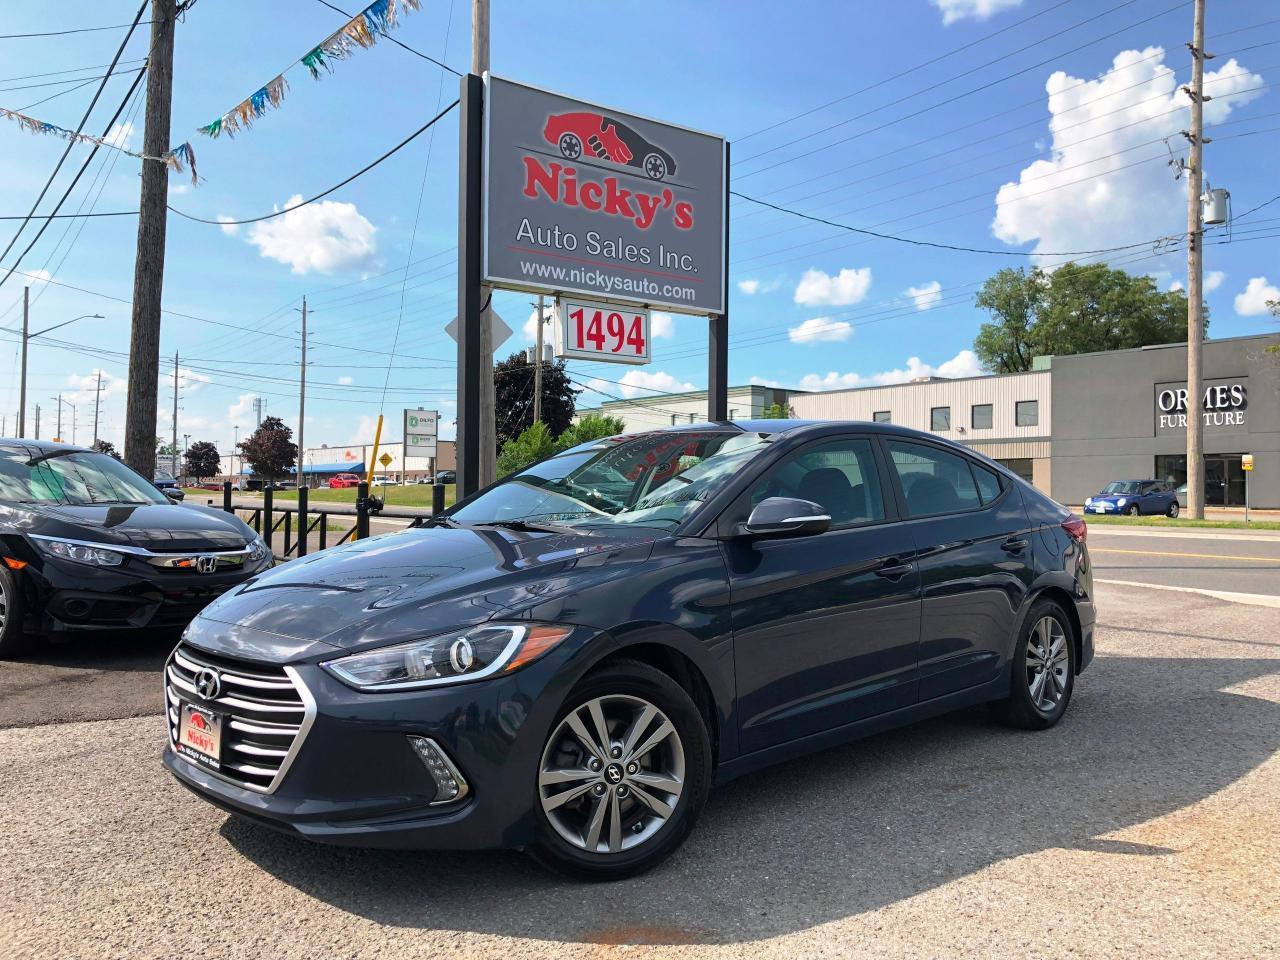 2017 Hyundai Elantra GL - BACKUP CAM - ALLOY WHEELS | $56 WEEKLY